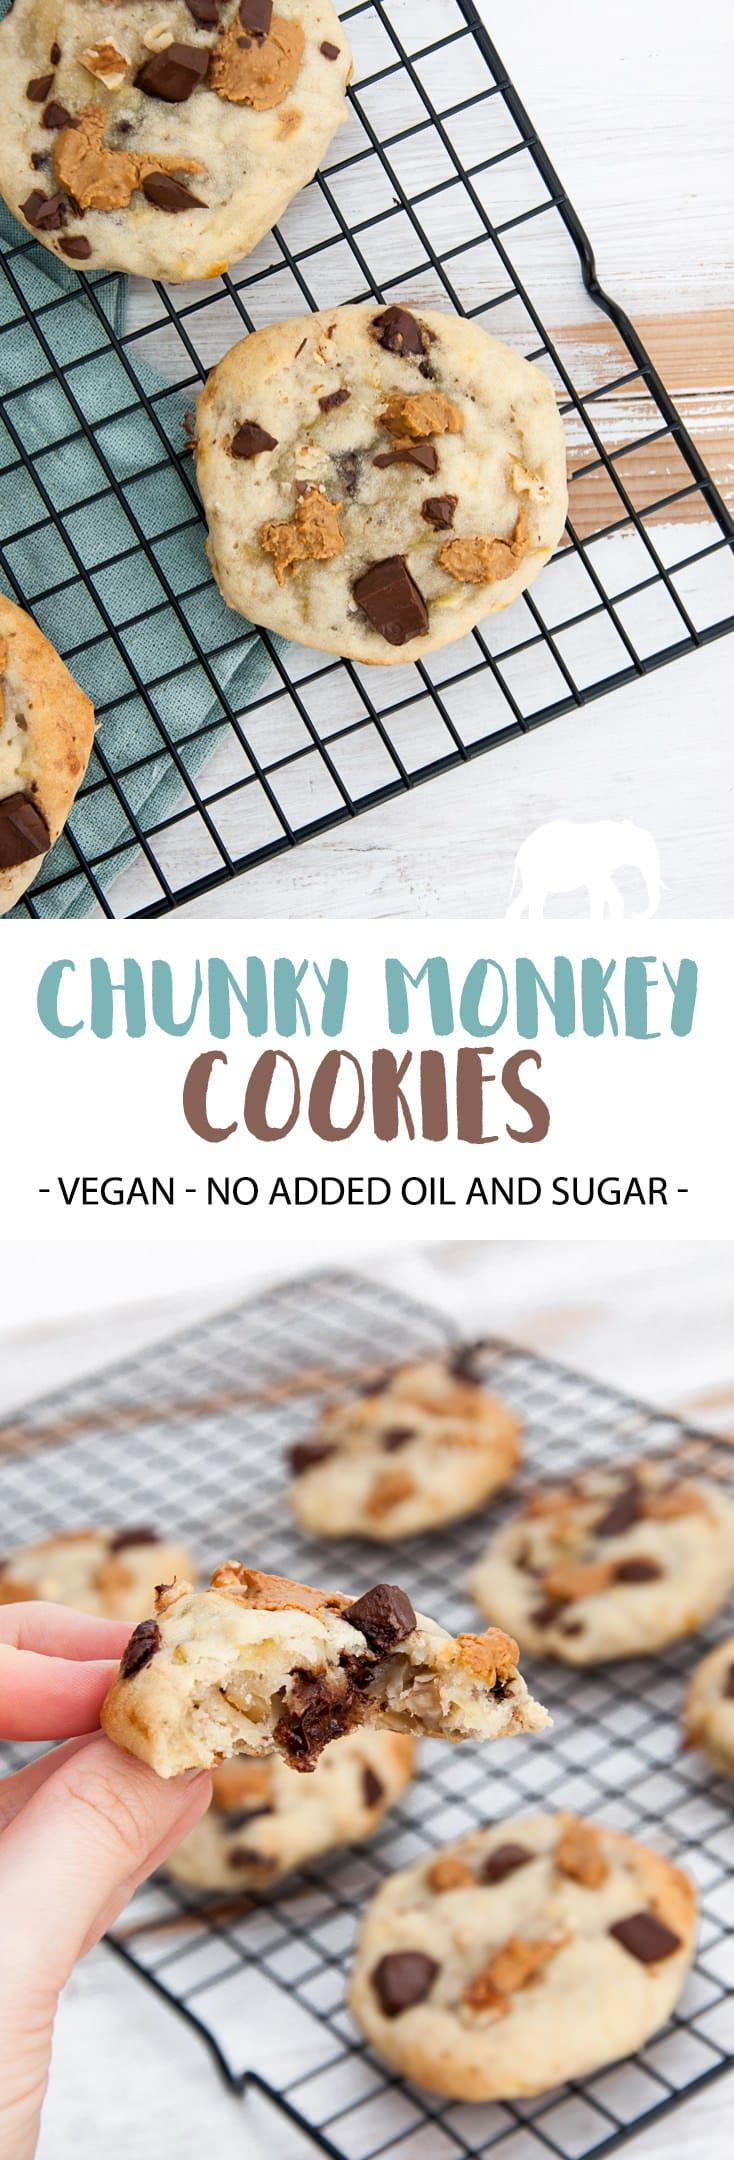 Chunky Monkey Cookies (Vegan, Oil-Free, Sugar-Free) | ElephantasticVegan.com #cookies #chunkymonkey #chocolate #peanutbutter #banana #dairyfree #vegan #oilfree #sugarfree